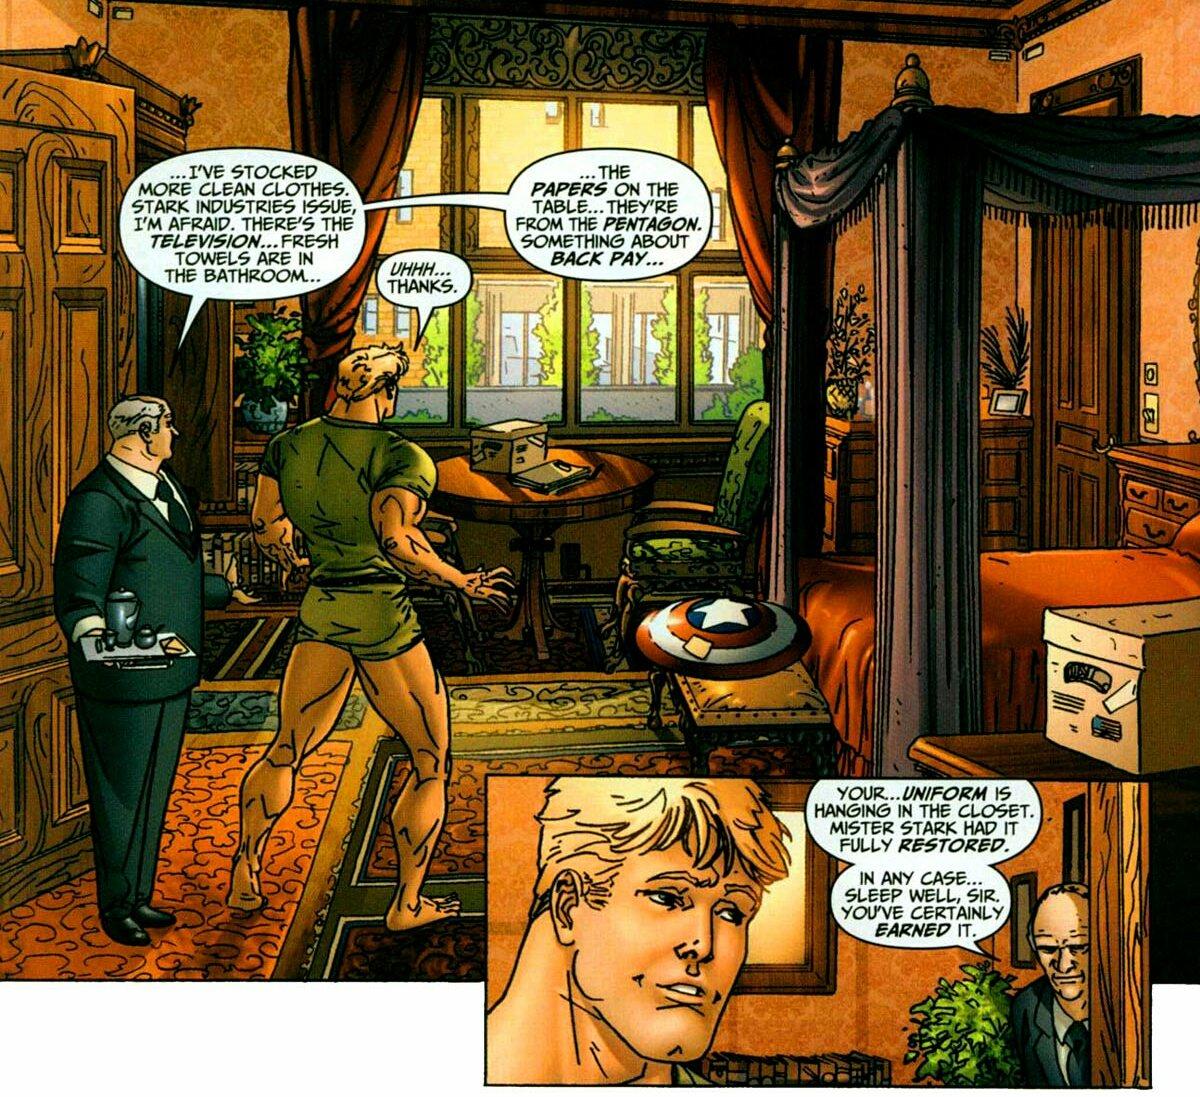 """Mr Stark had your uniform fully restored."" ""Welcome back, Cap.""  #SteveTony #CanonStony #stony #AvengersEarthsMightiestHeroes #issue2 #year2005 pic.twitter.com/yQsdNADrYt"